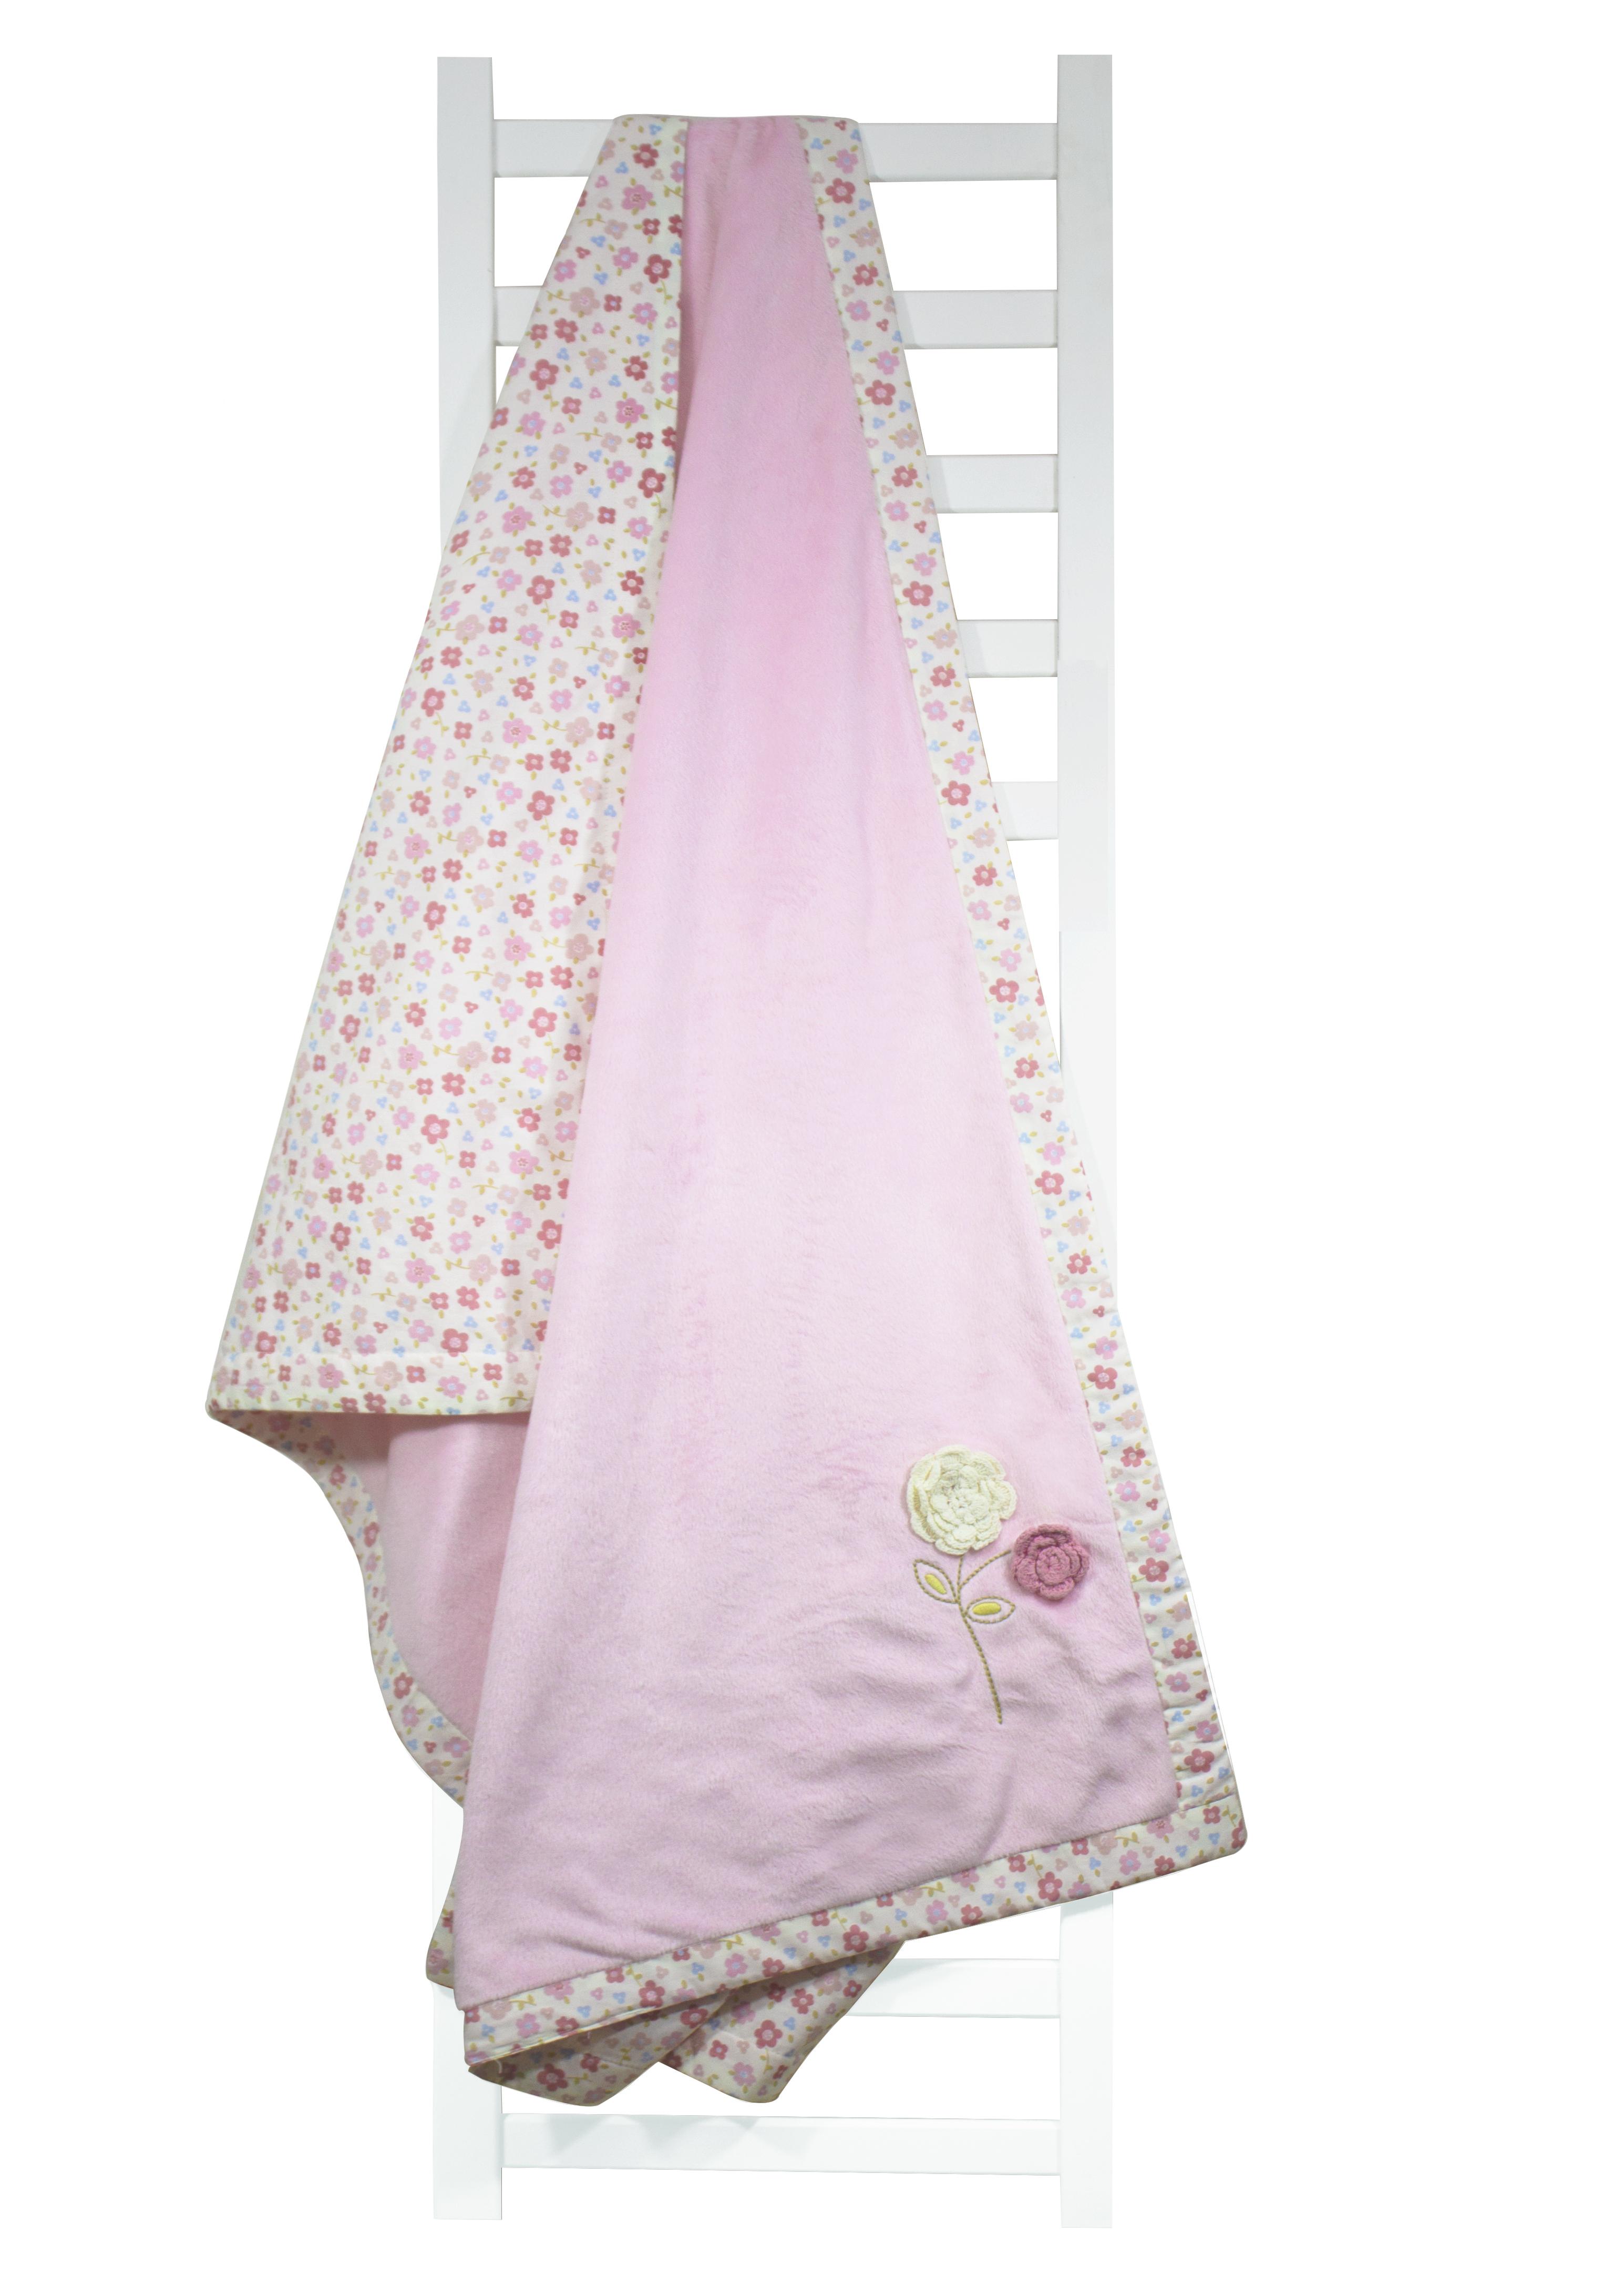 Mothercare | Abracadabra Plush Blanket - Vintage Floral